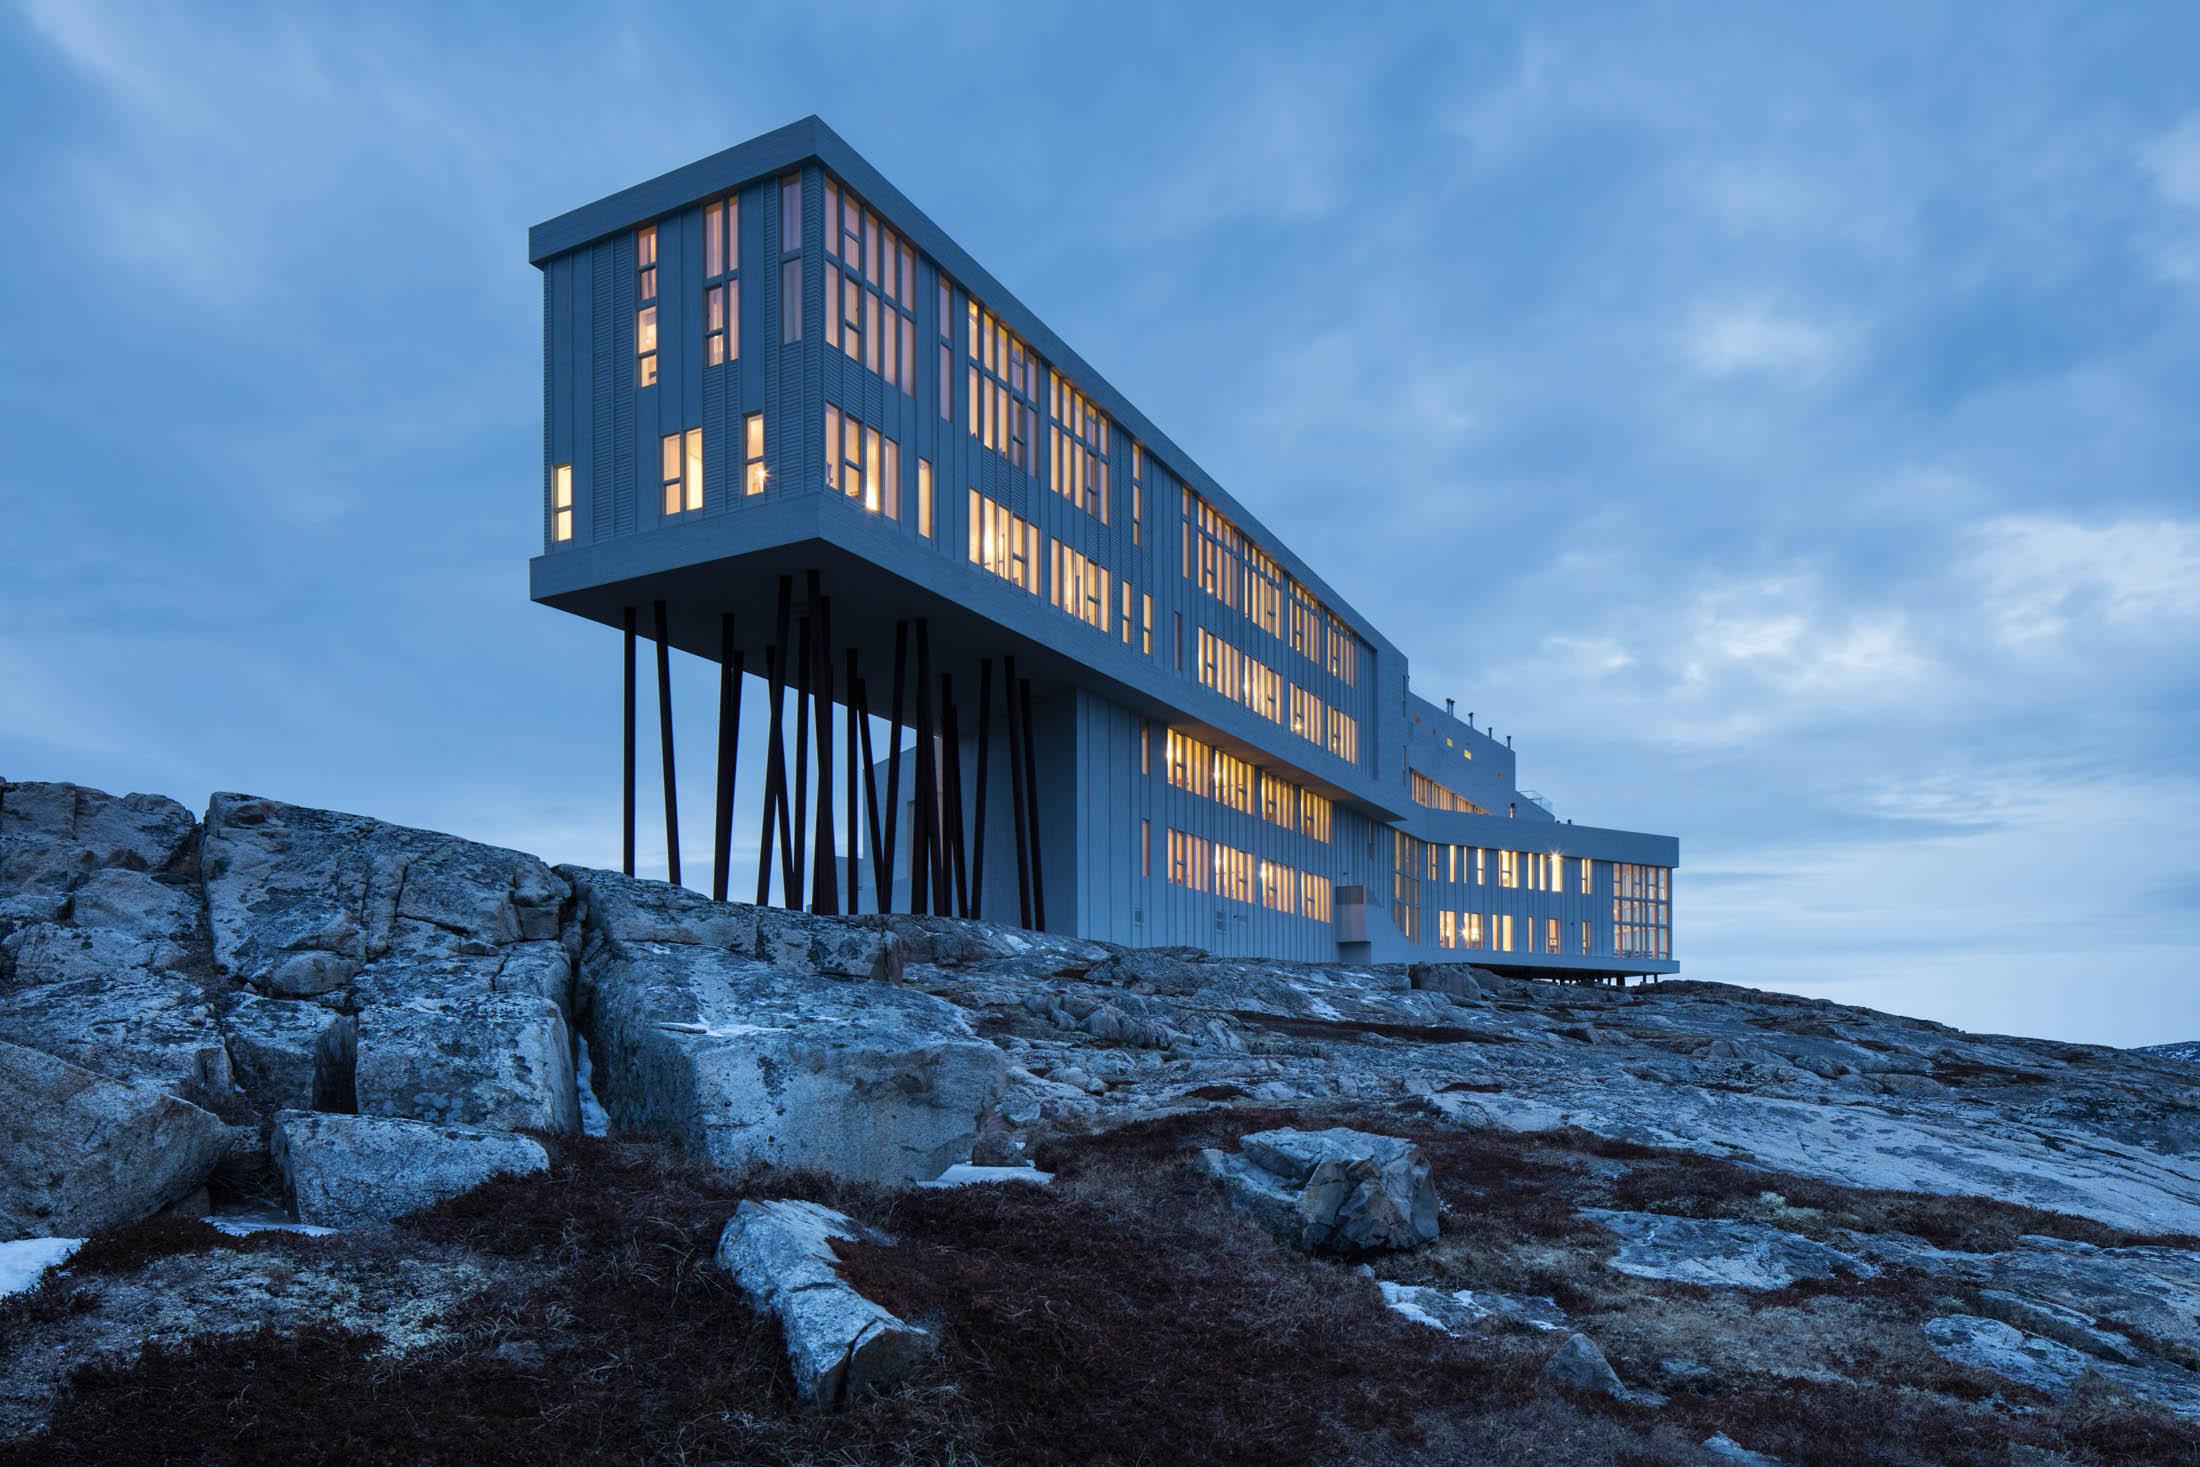 fogo-island-Inn-newfoundland-bloomberg-pursuits-wide-lede.jpg